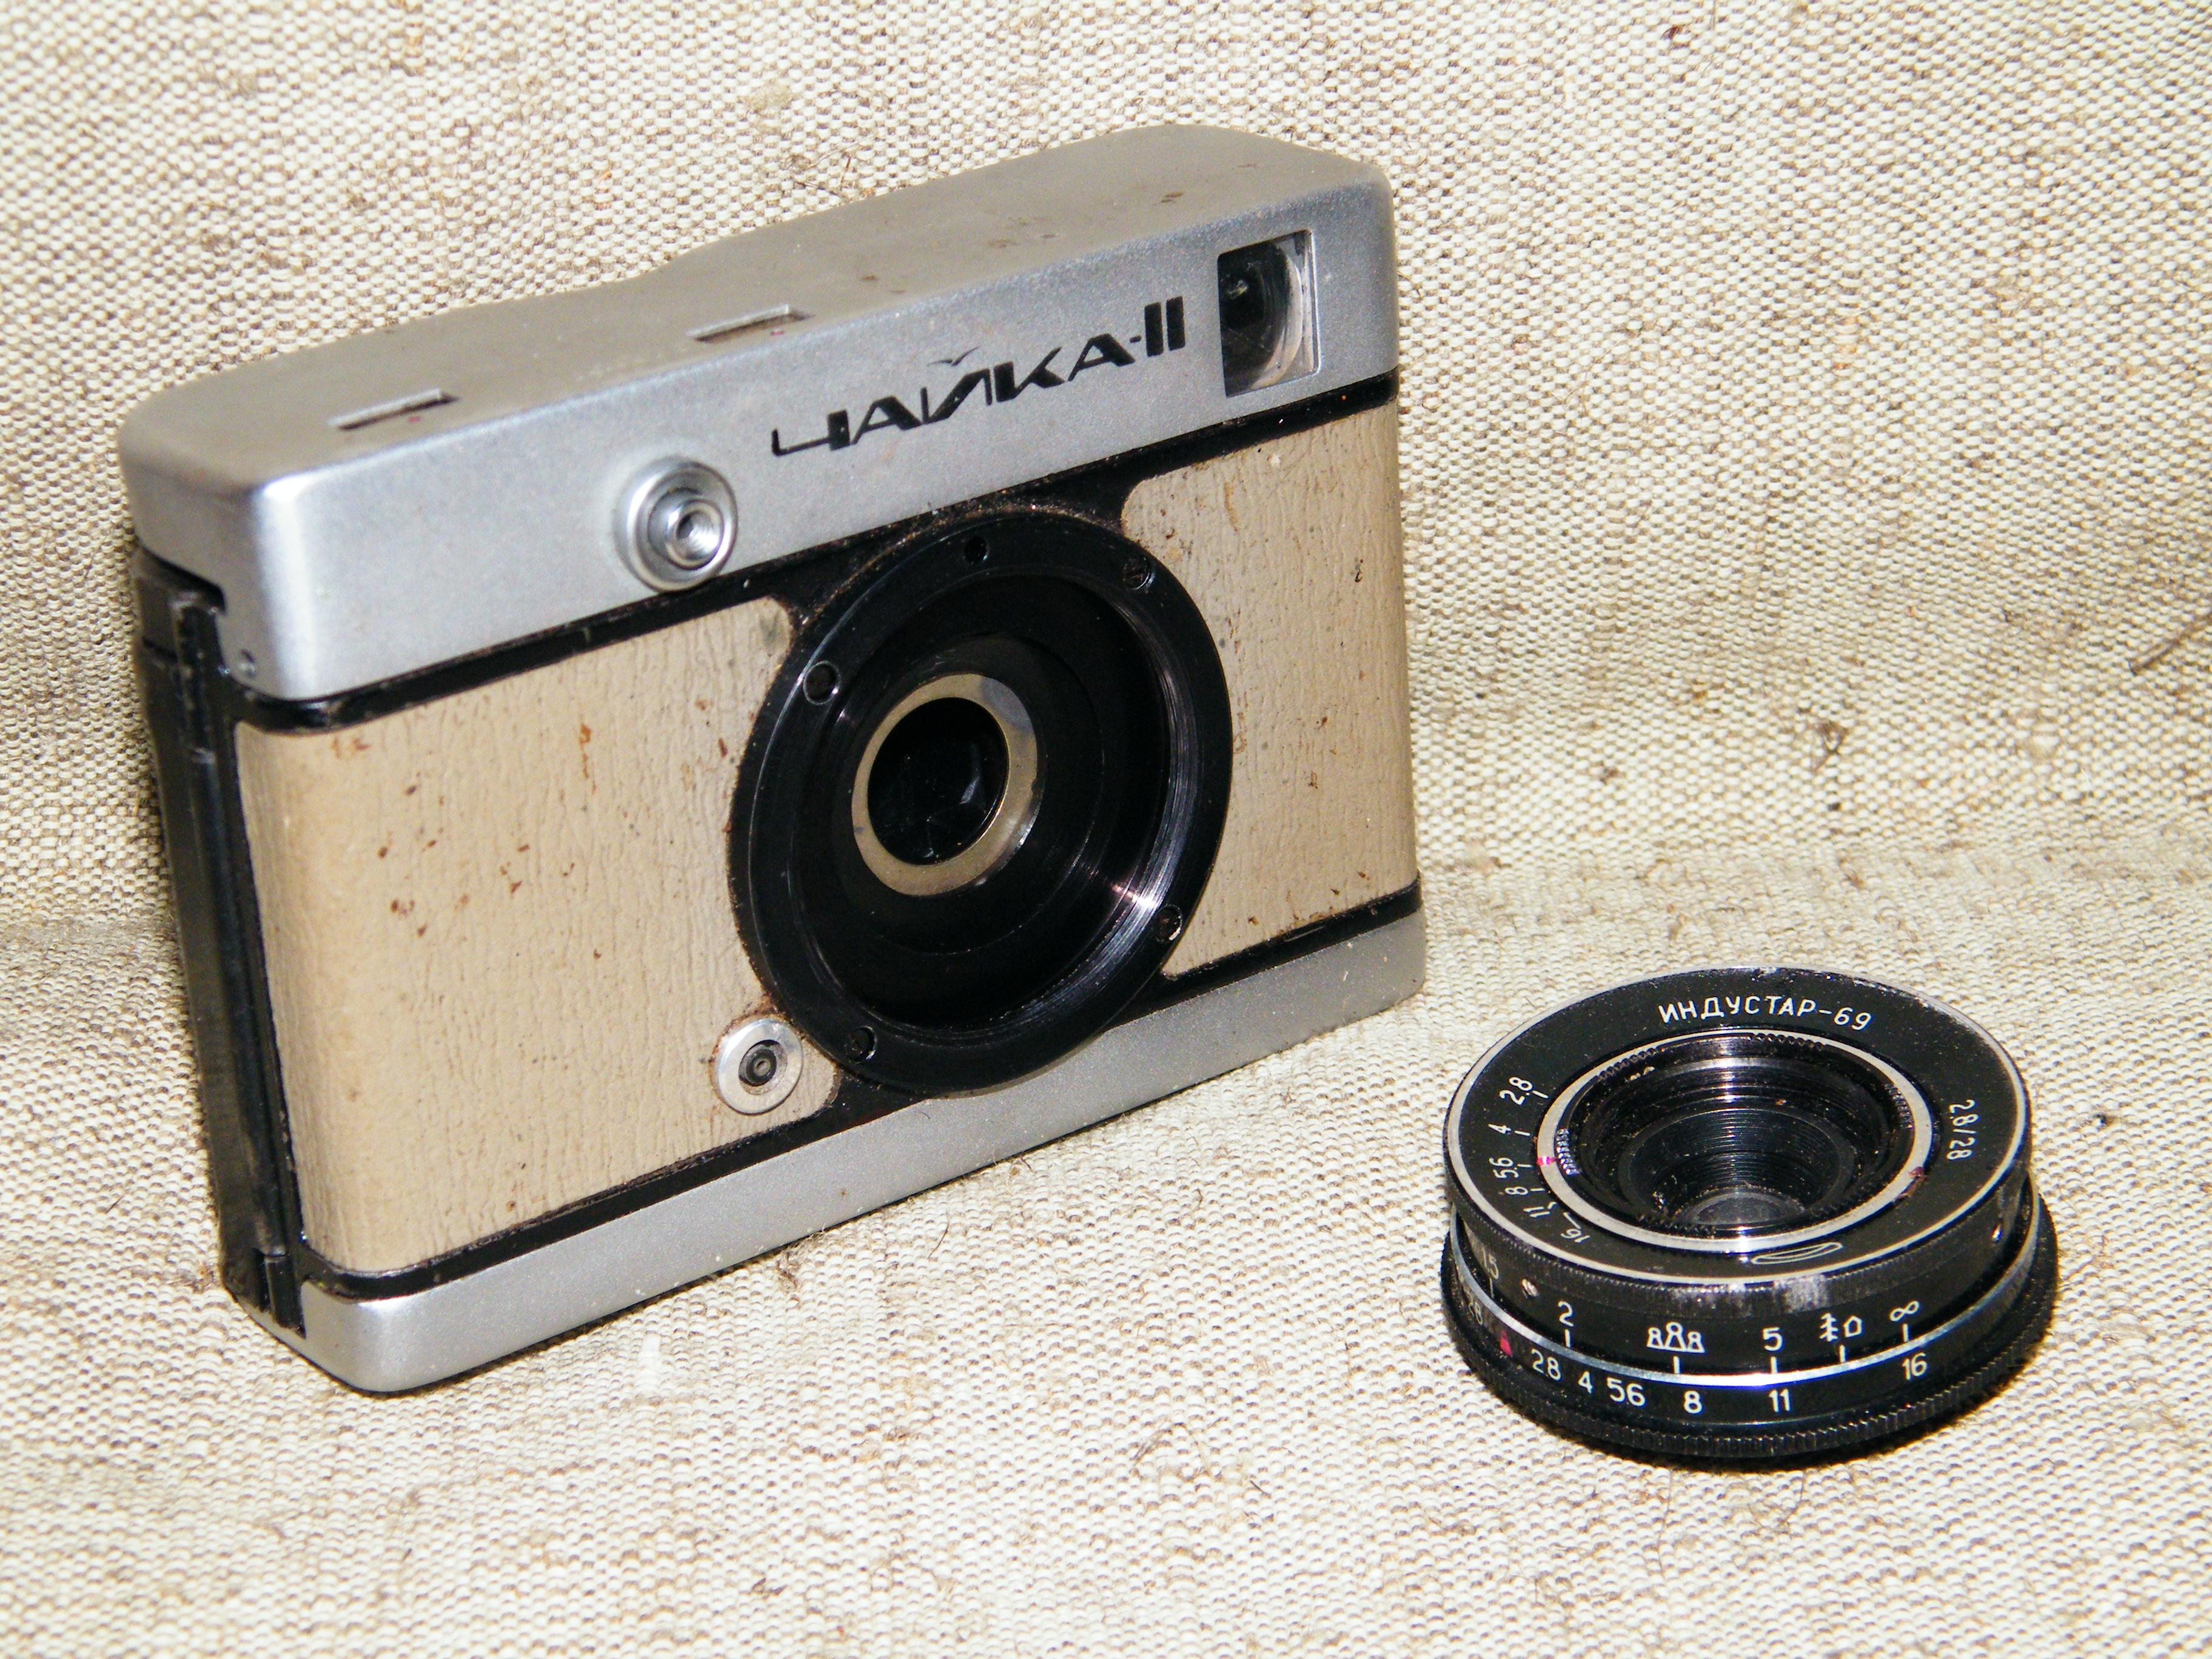 На фотоаппарате стоял объектив в оправе с посадочной резьбой м39=1 и рабочим отрезком 27,5